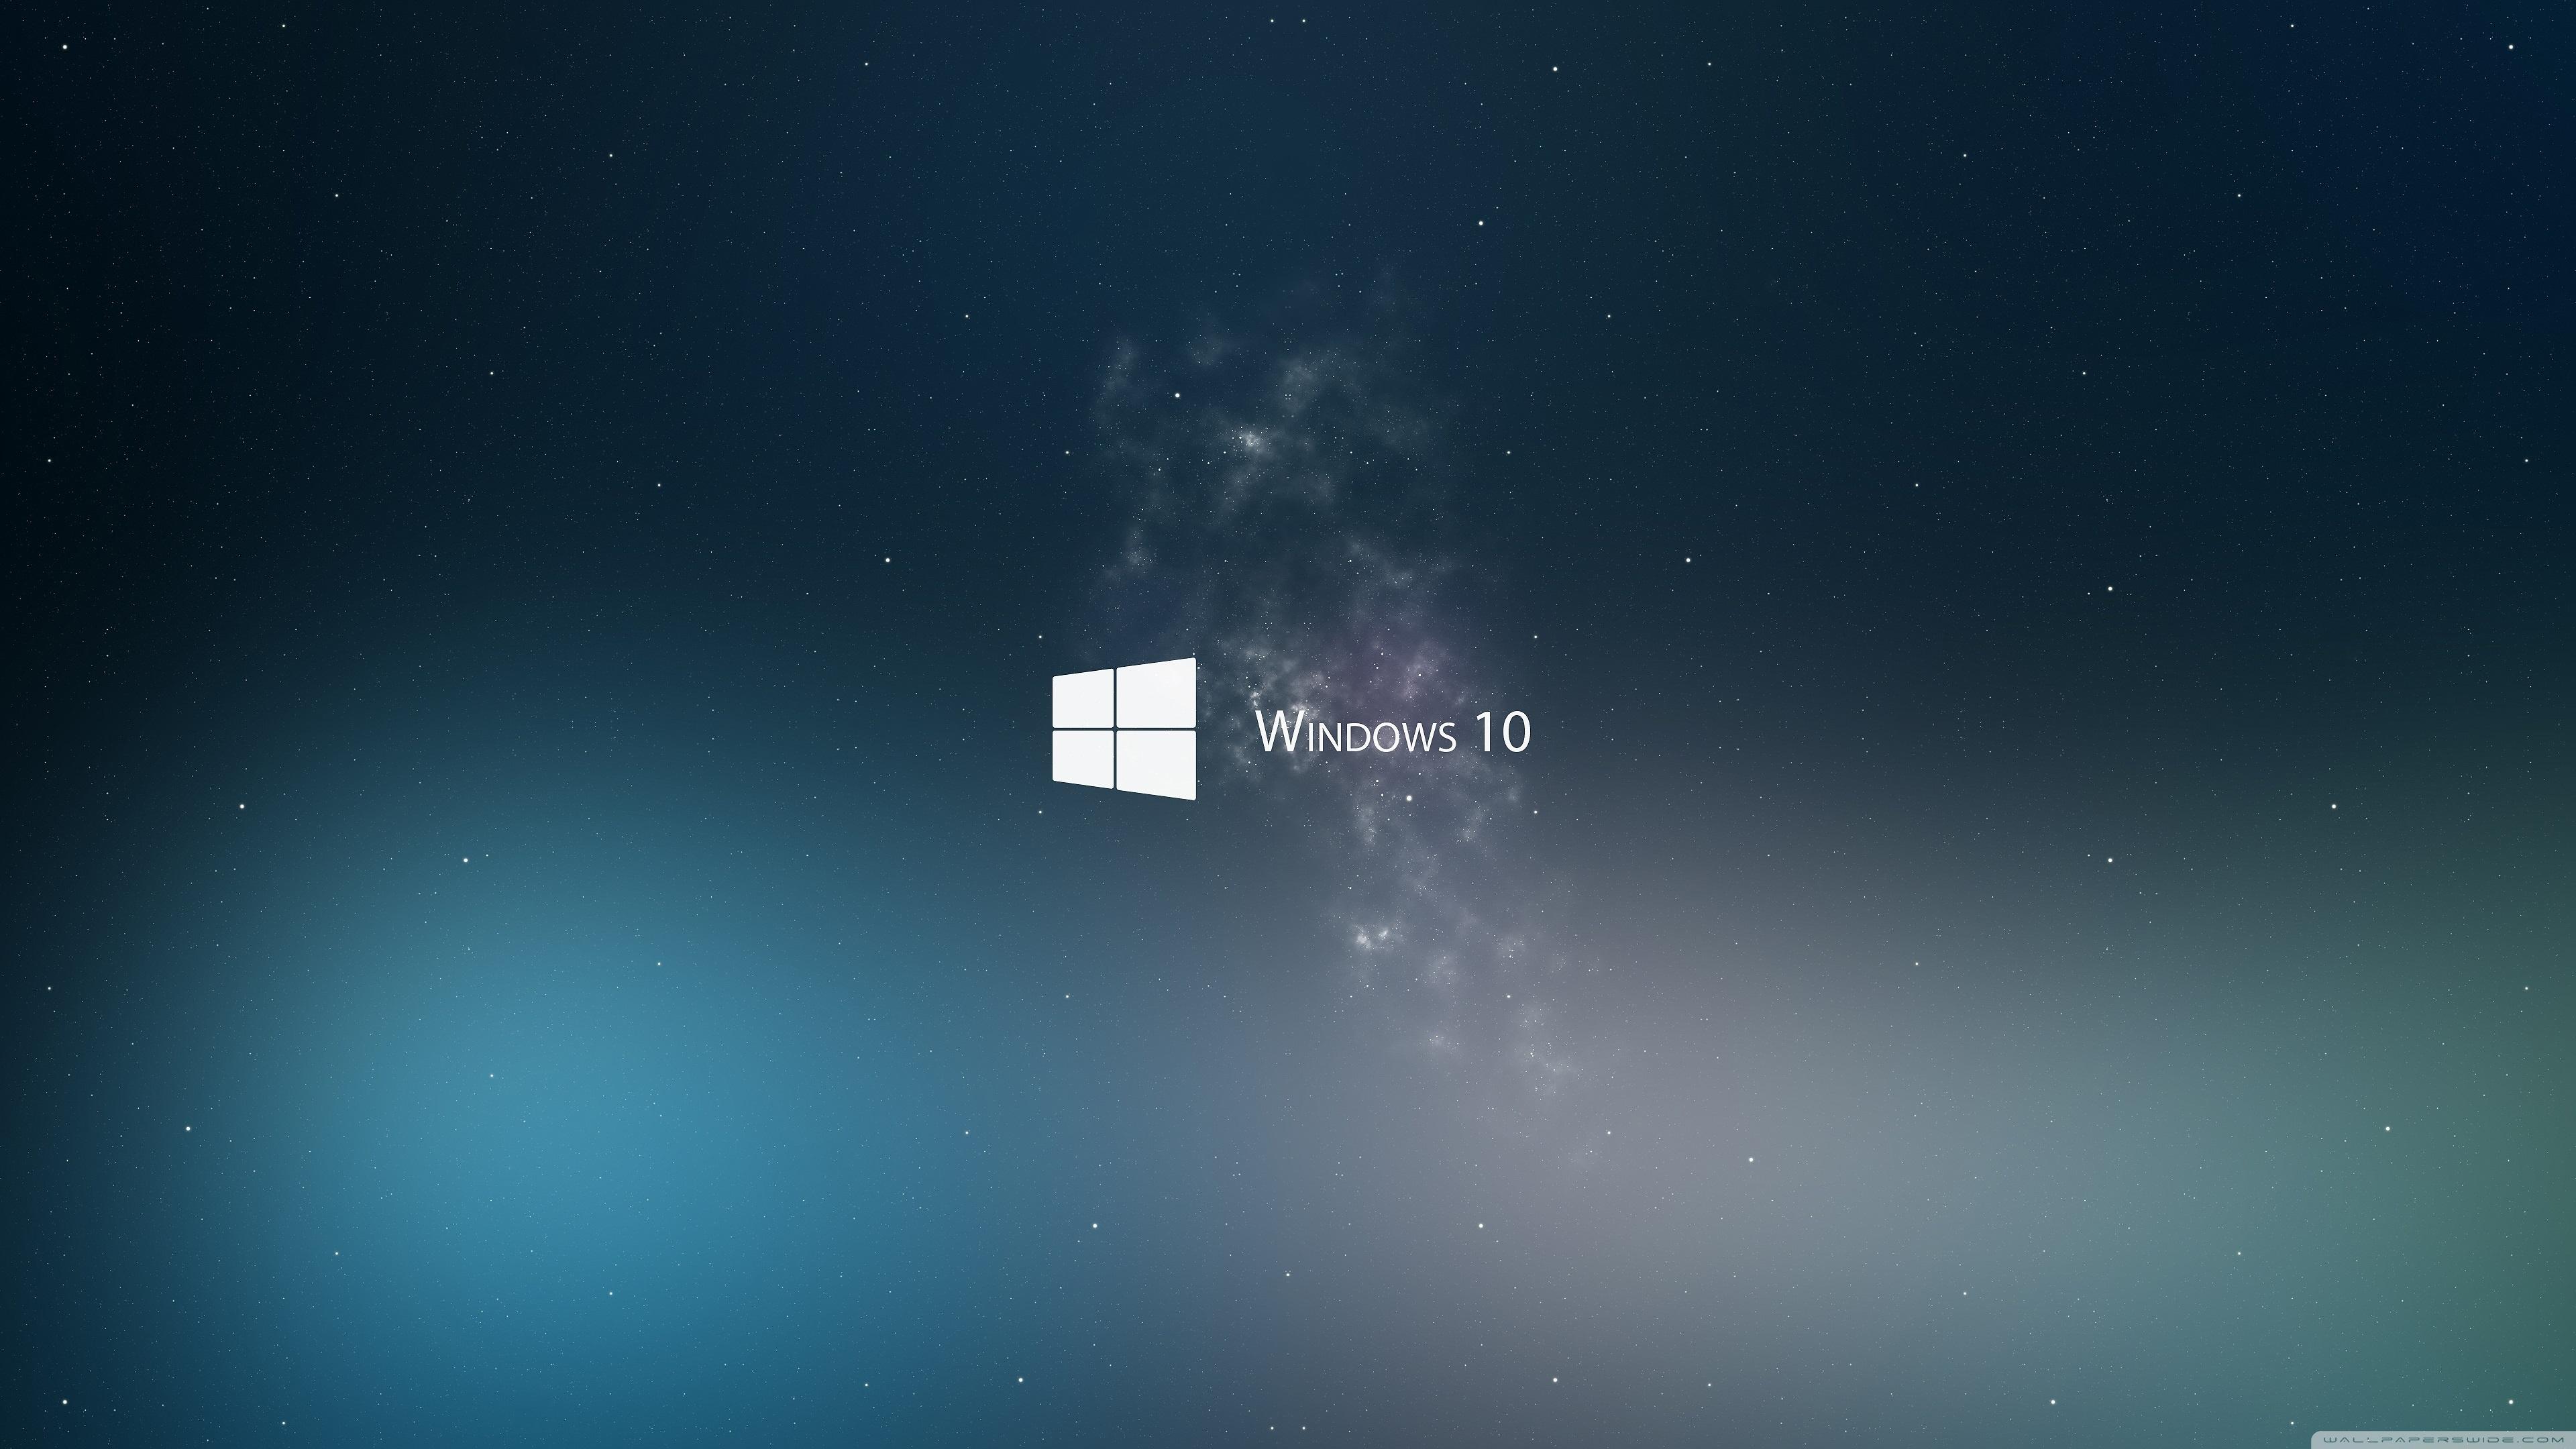 wallpaperswide com windows hd